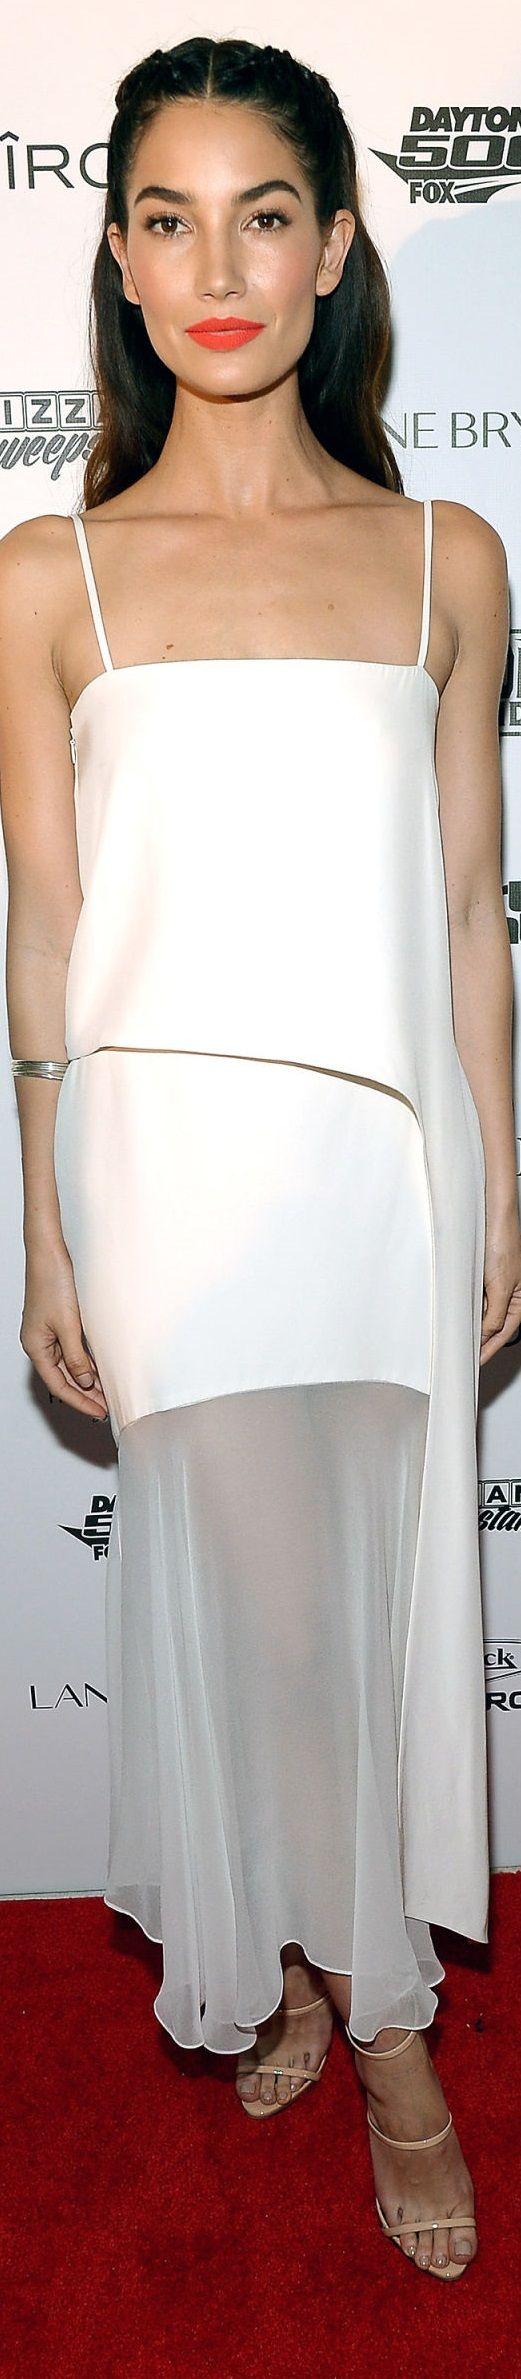 17 Best images about Lily Aldridge on Pinterest | Stripe ...